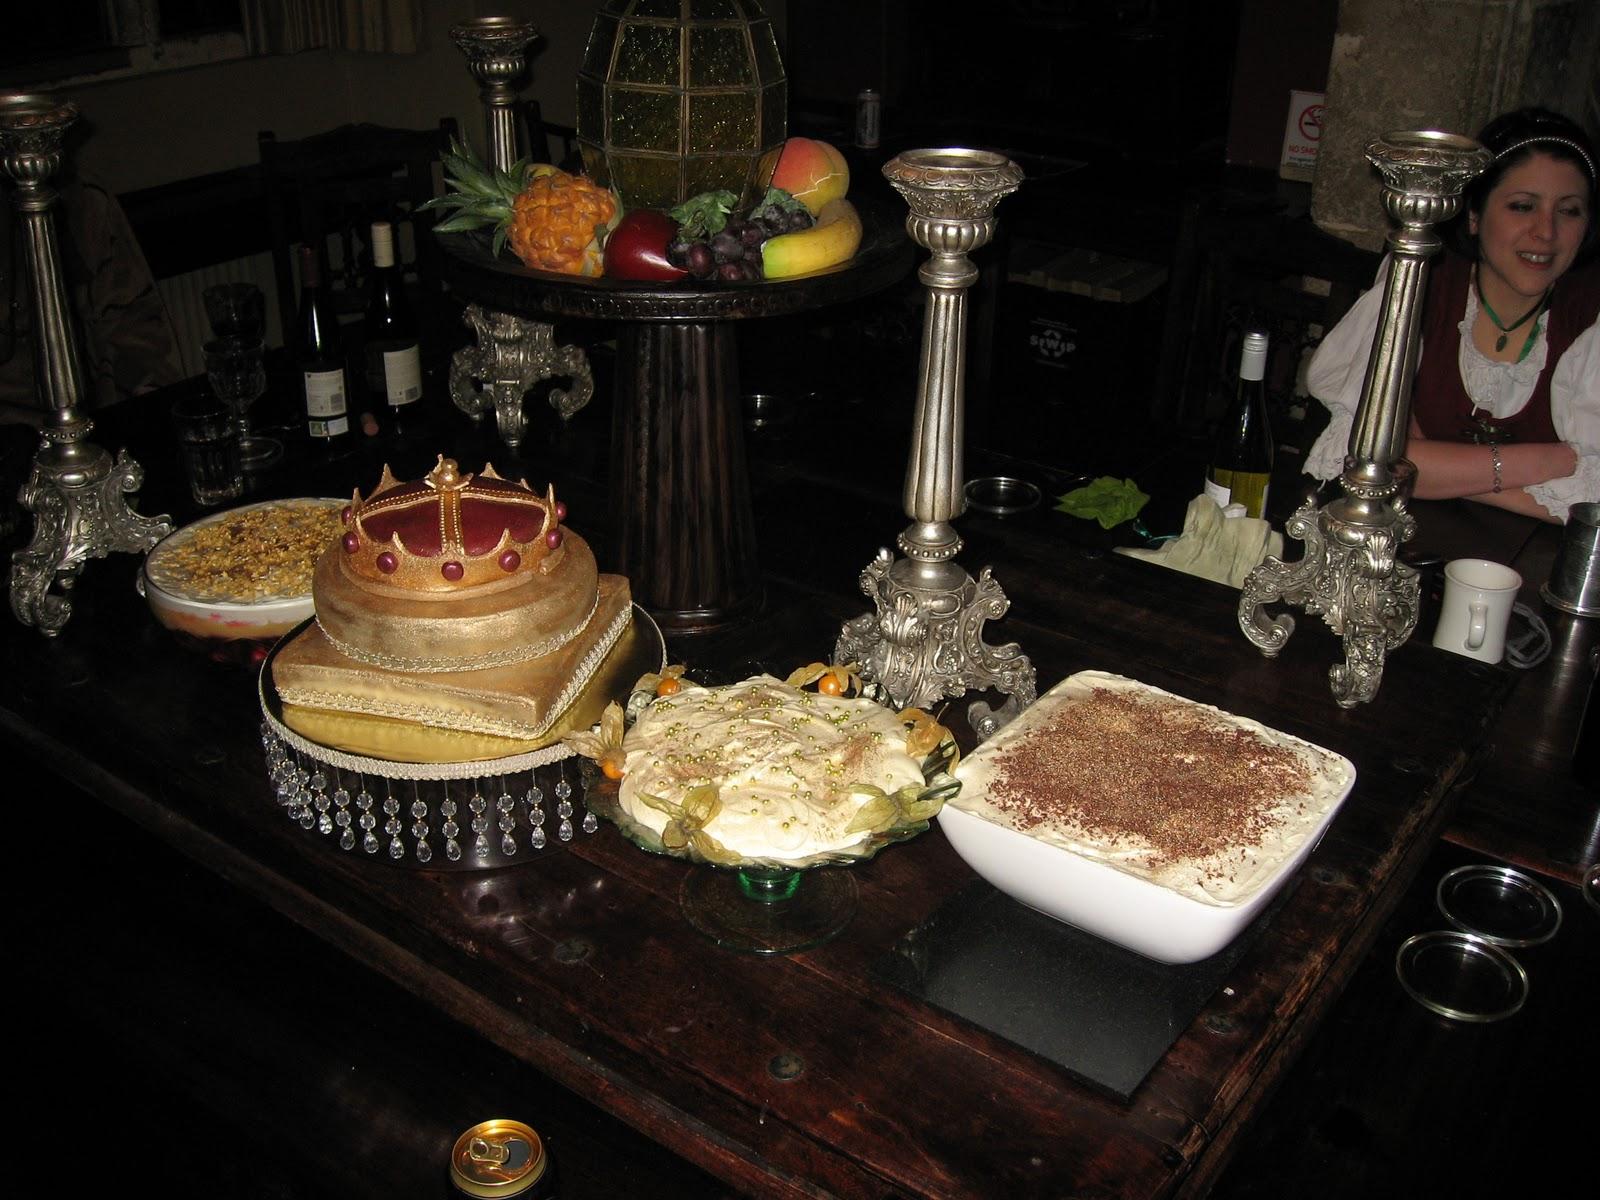 Groovy 8 Renasannce Birthday Cakes Photo Medieval Theme Birthday Cakes Funny Birthday Cards Online Overcheapnameinfo